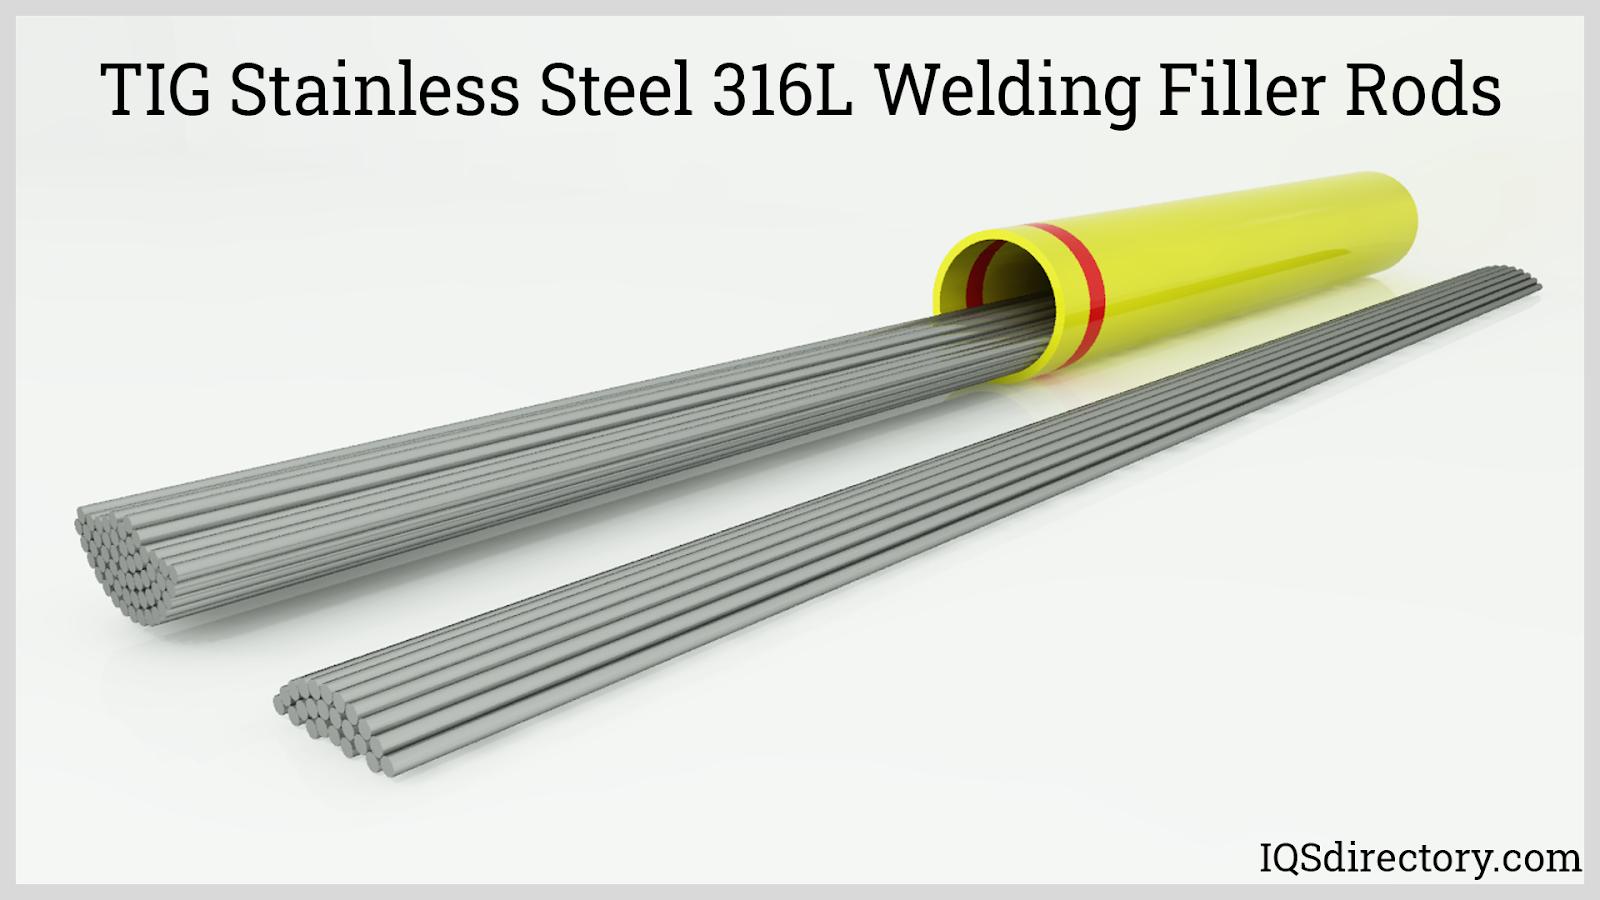 TIG Stainless Steel 316L Welding Filler Rods